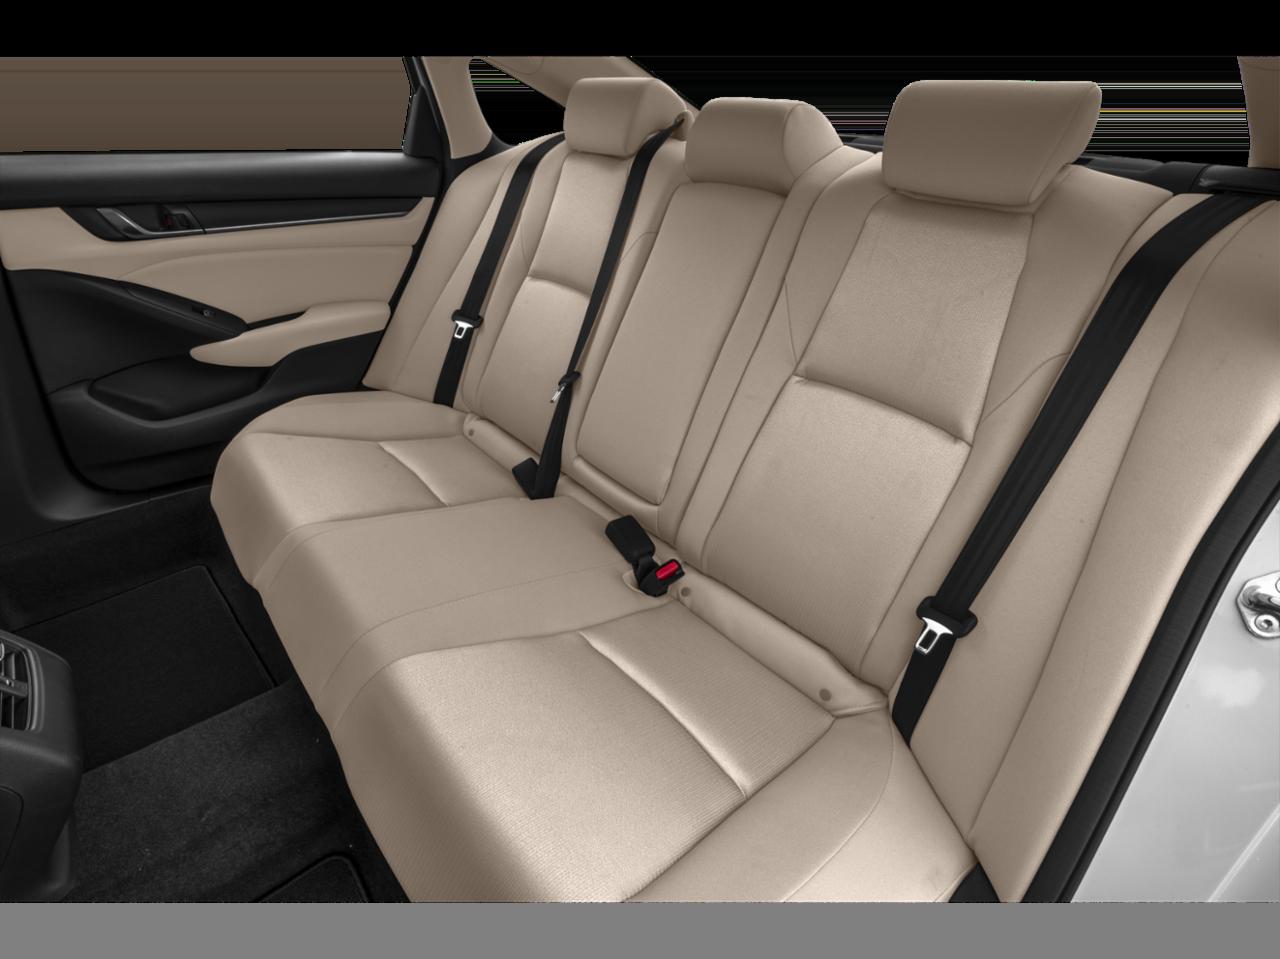 2019 Honda Accord Hybrid EX Sedan Inside 2